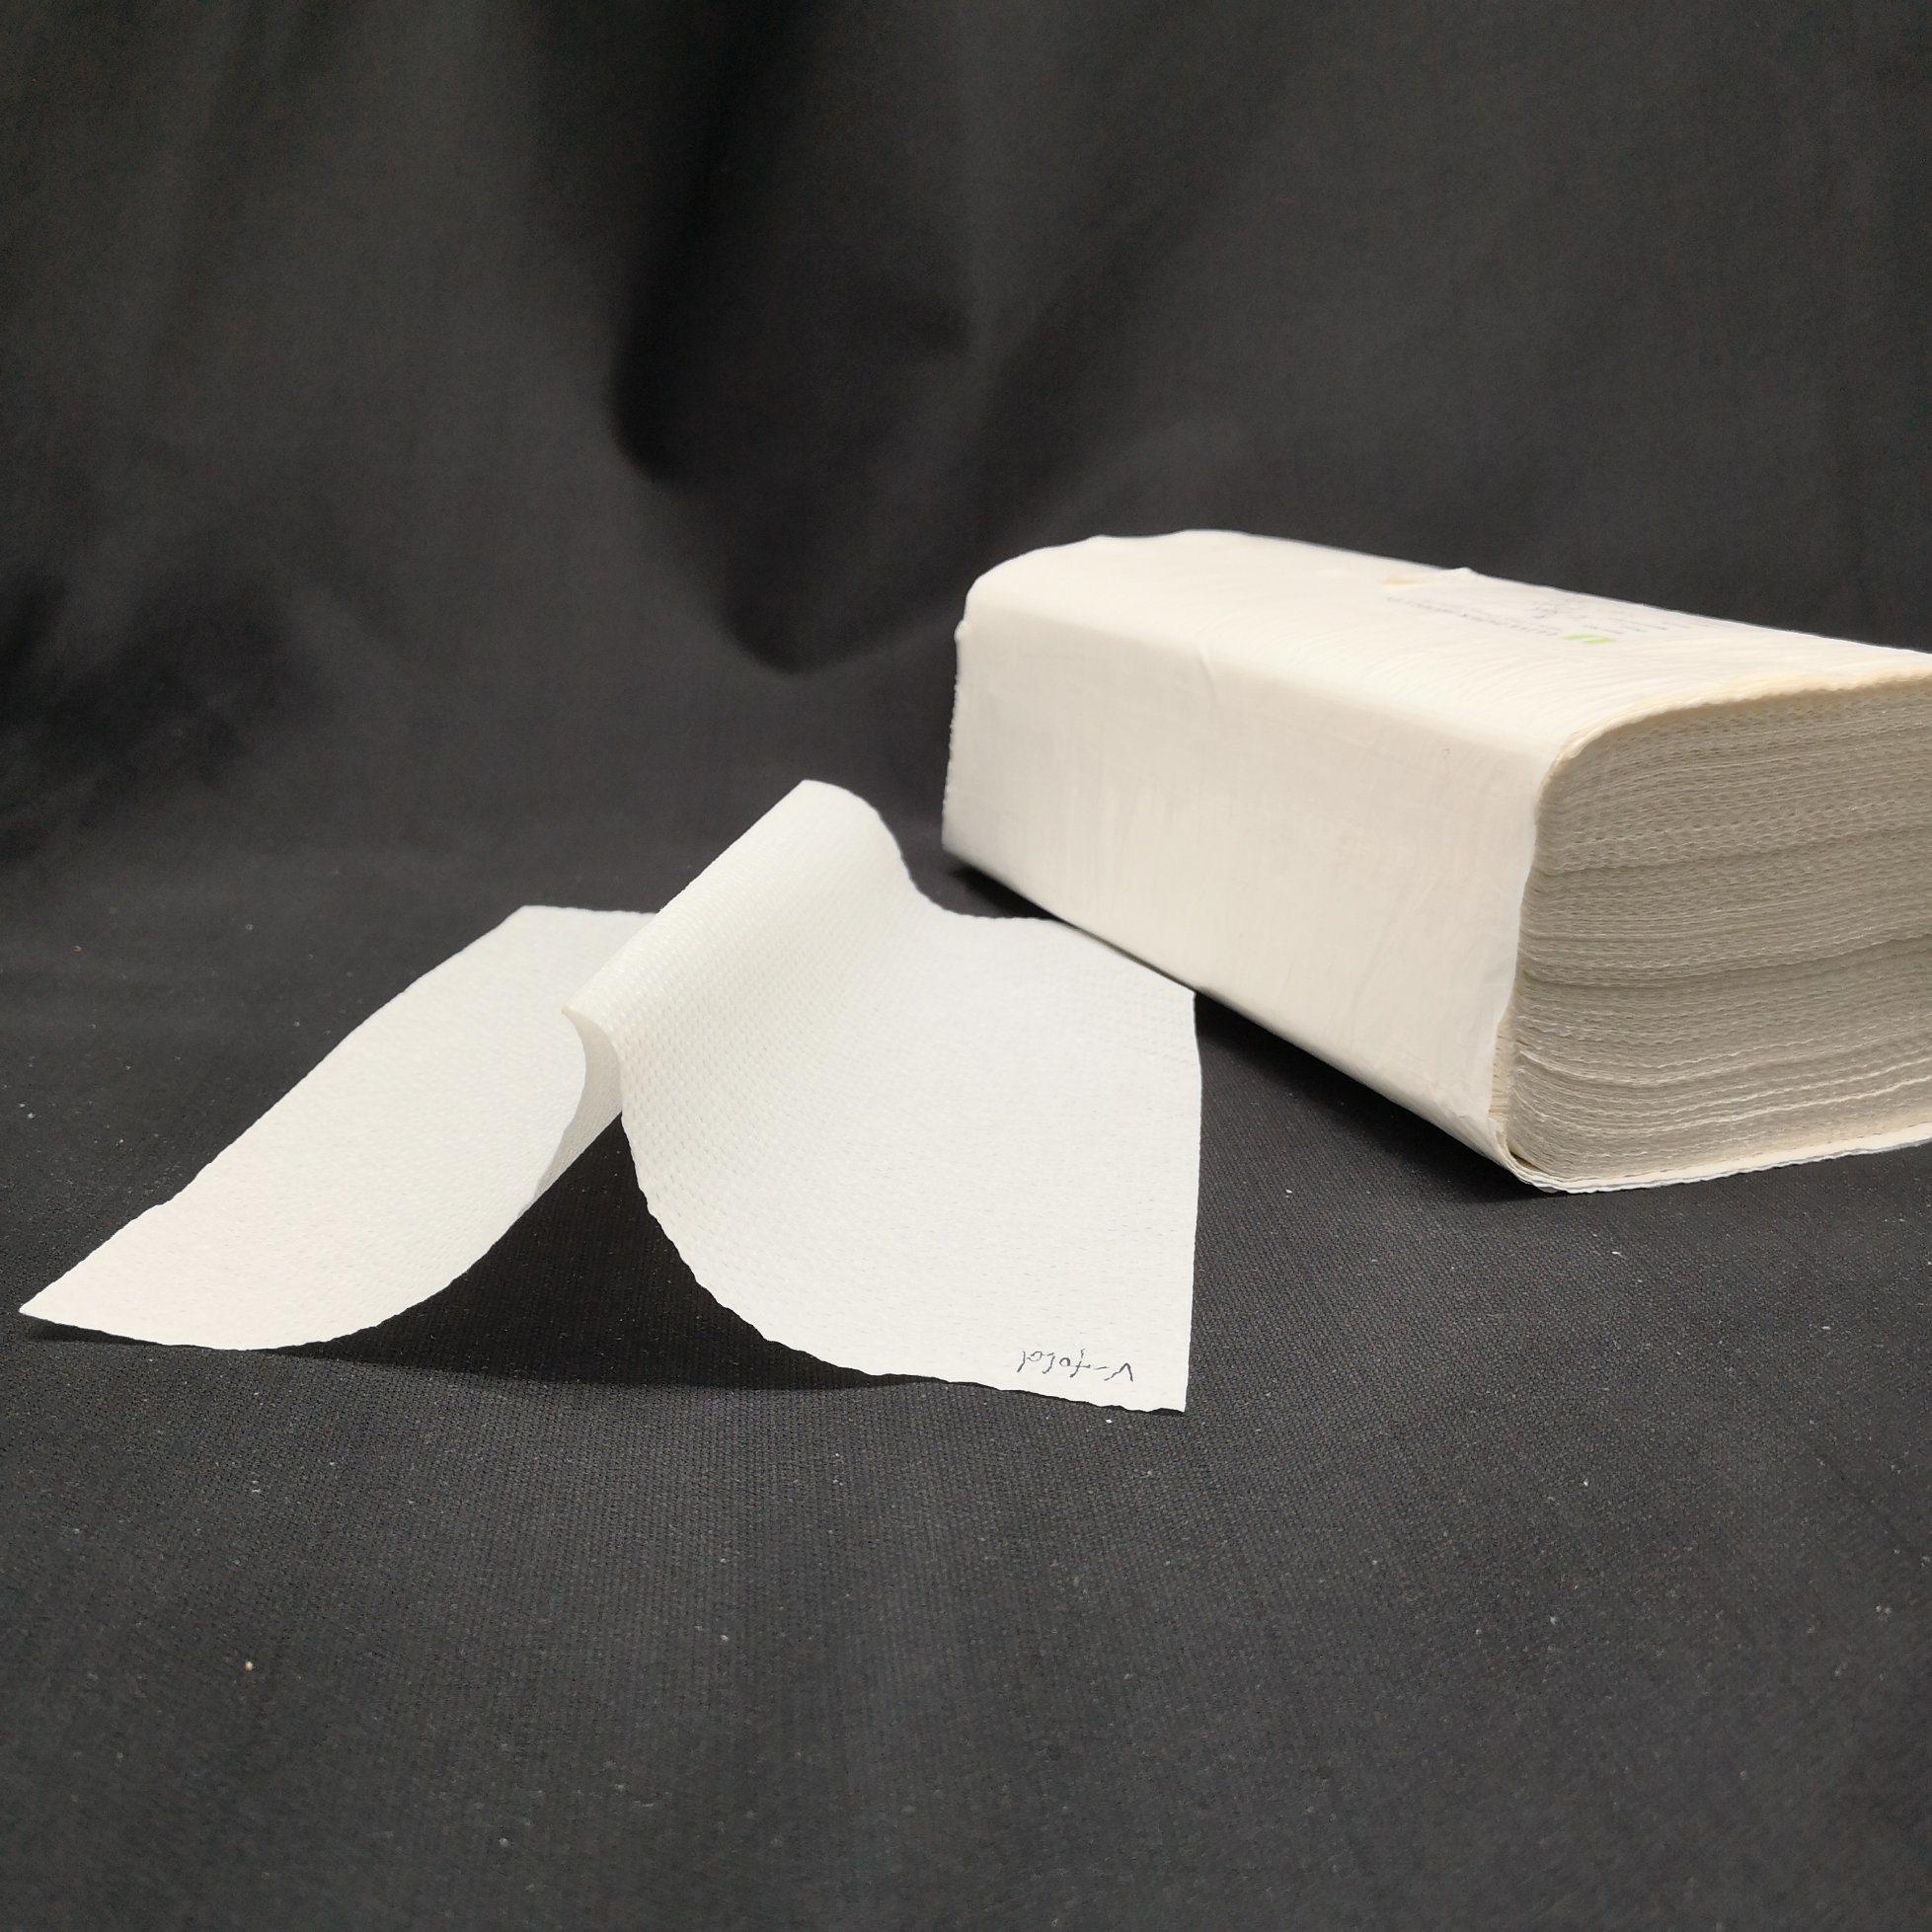 5000 Paper Towels Towel Paper V-Fold Folding Towels Hand Towel 25 x 23 cm